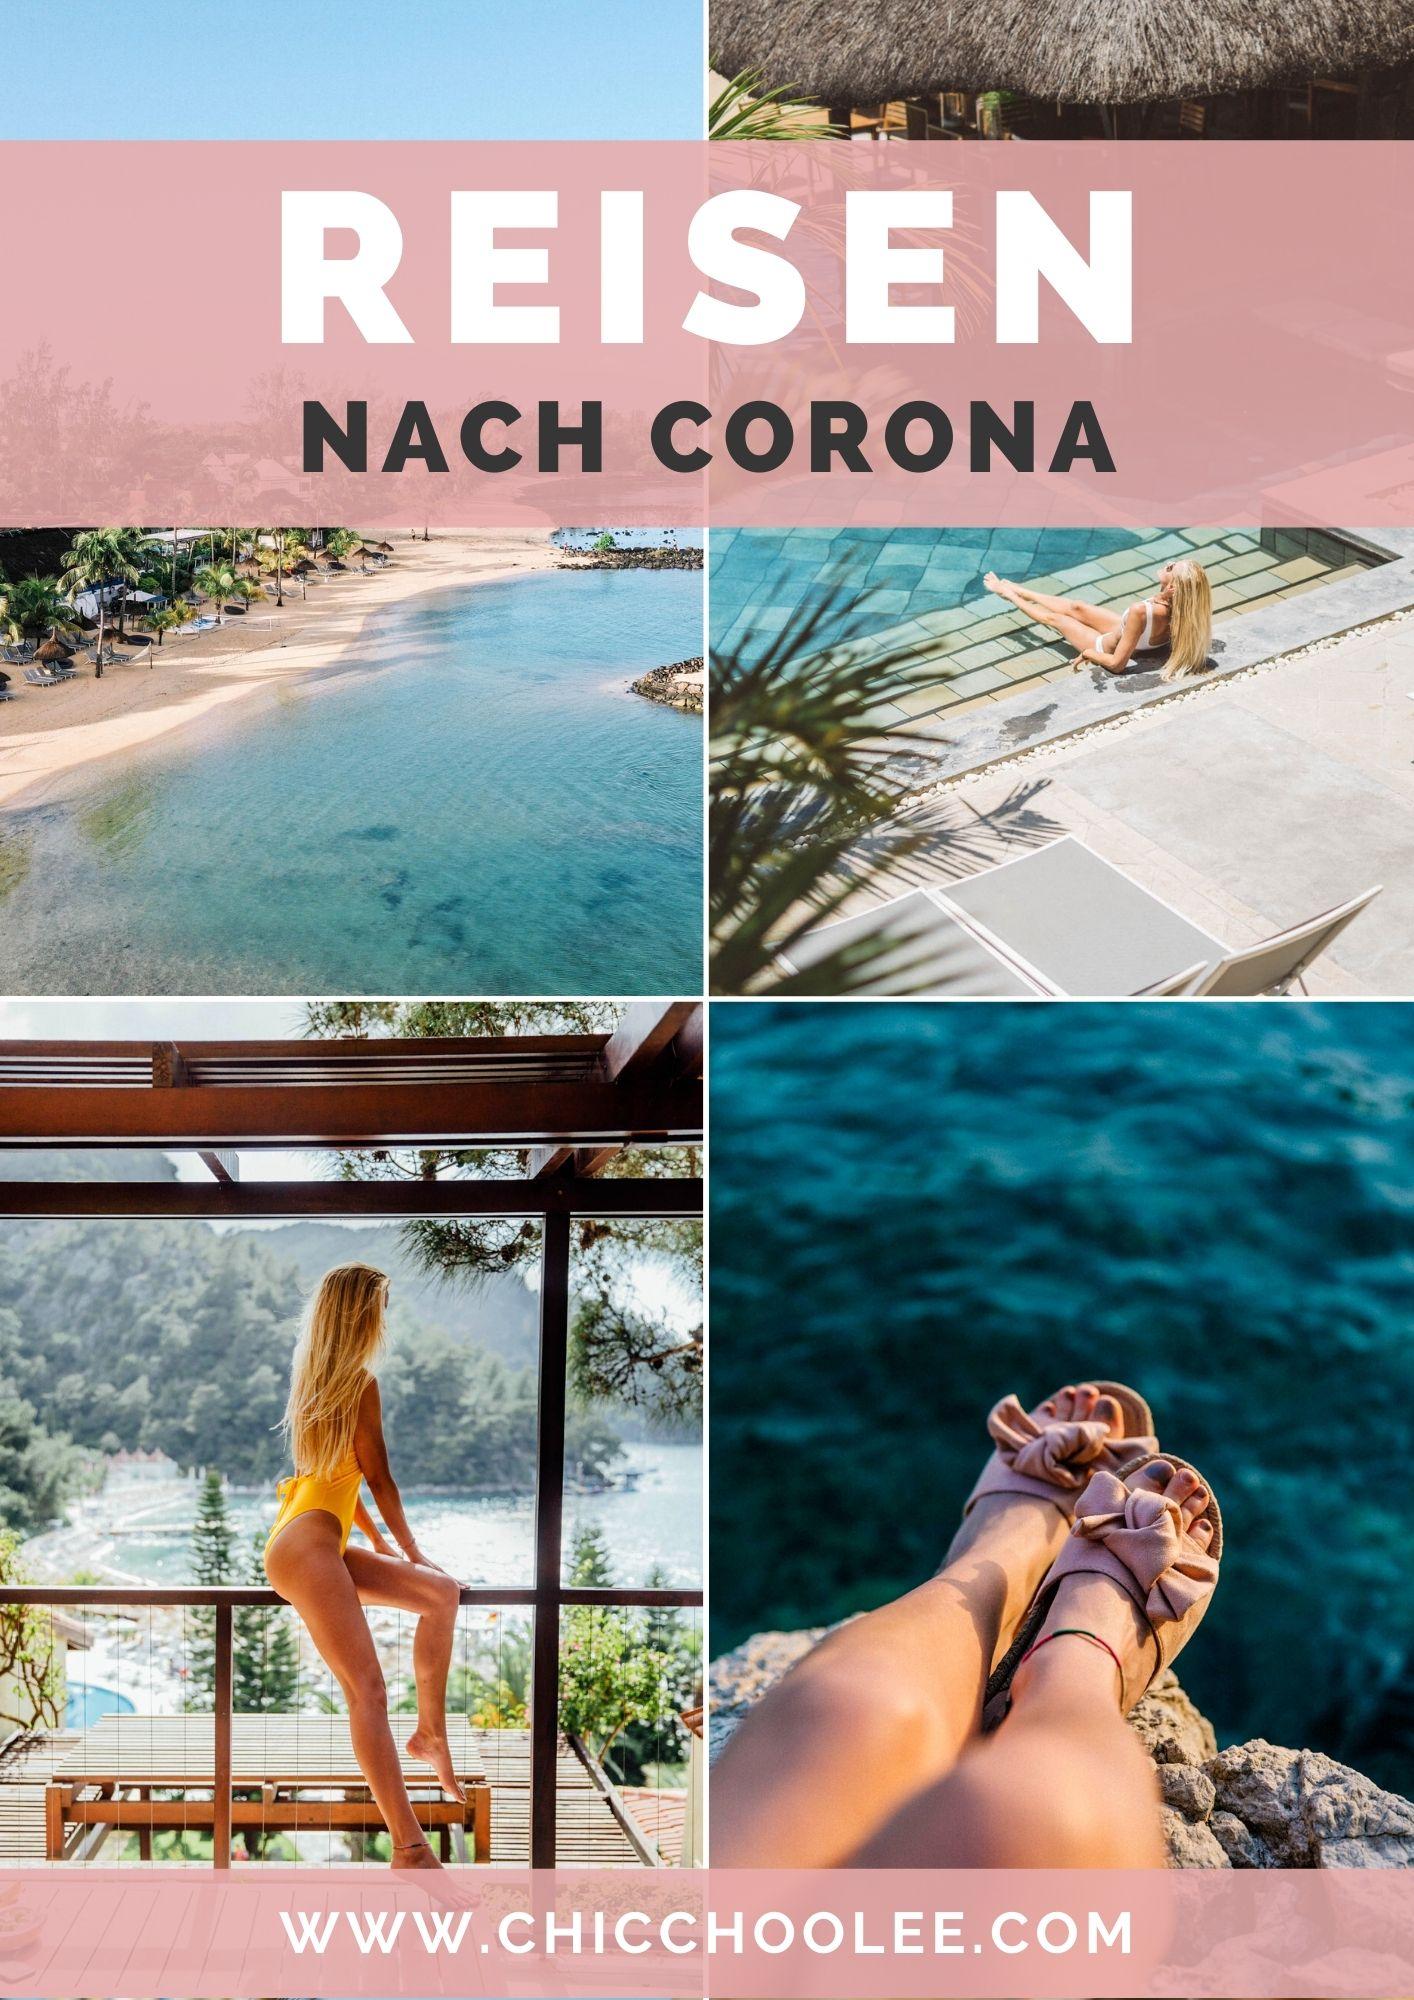 Reisen nach Corona